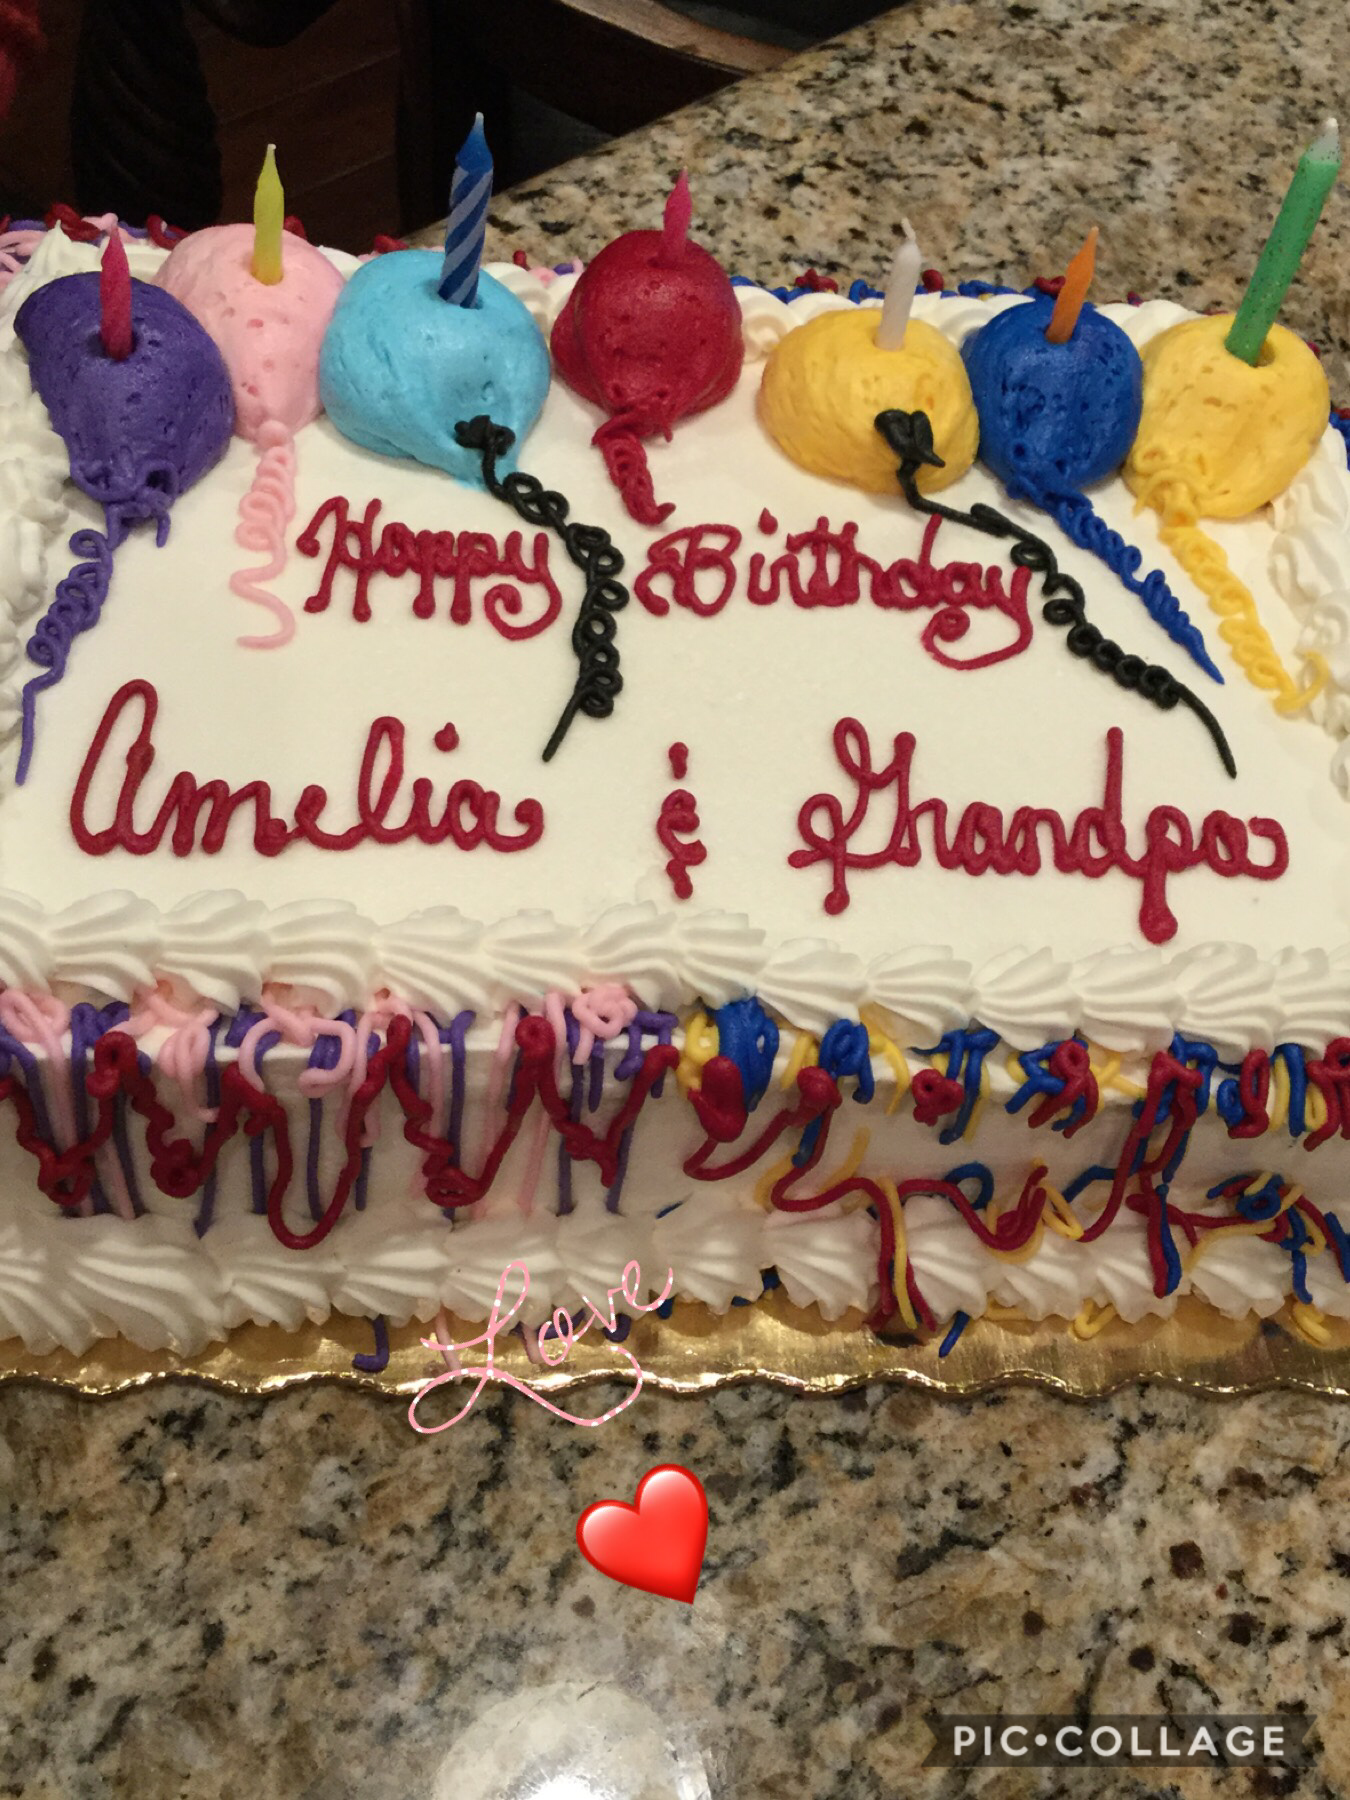 Happy birthday to my Grandpa And Cousin